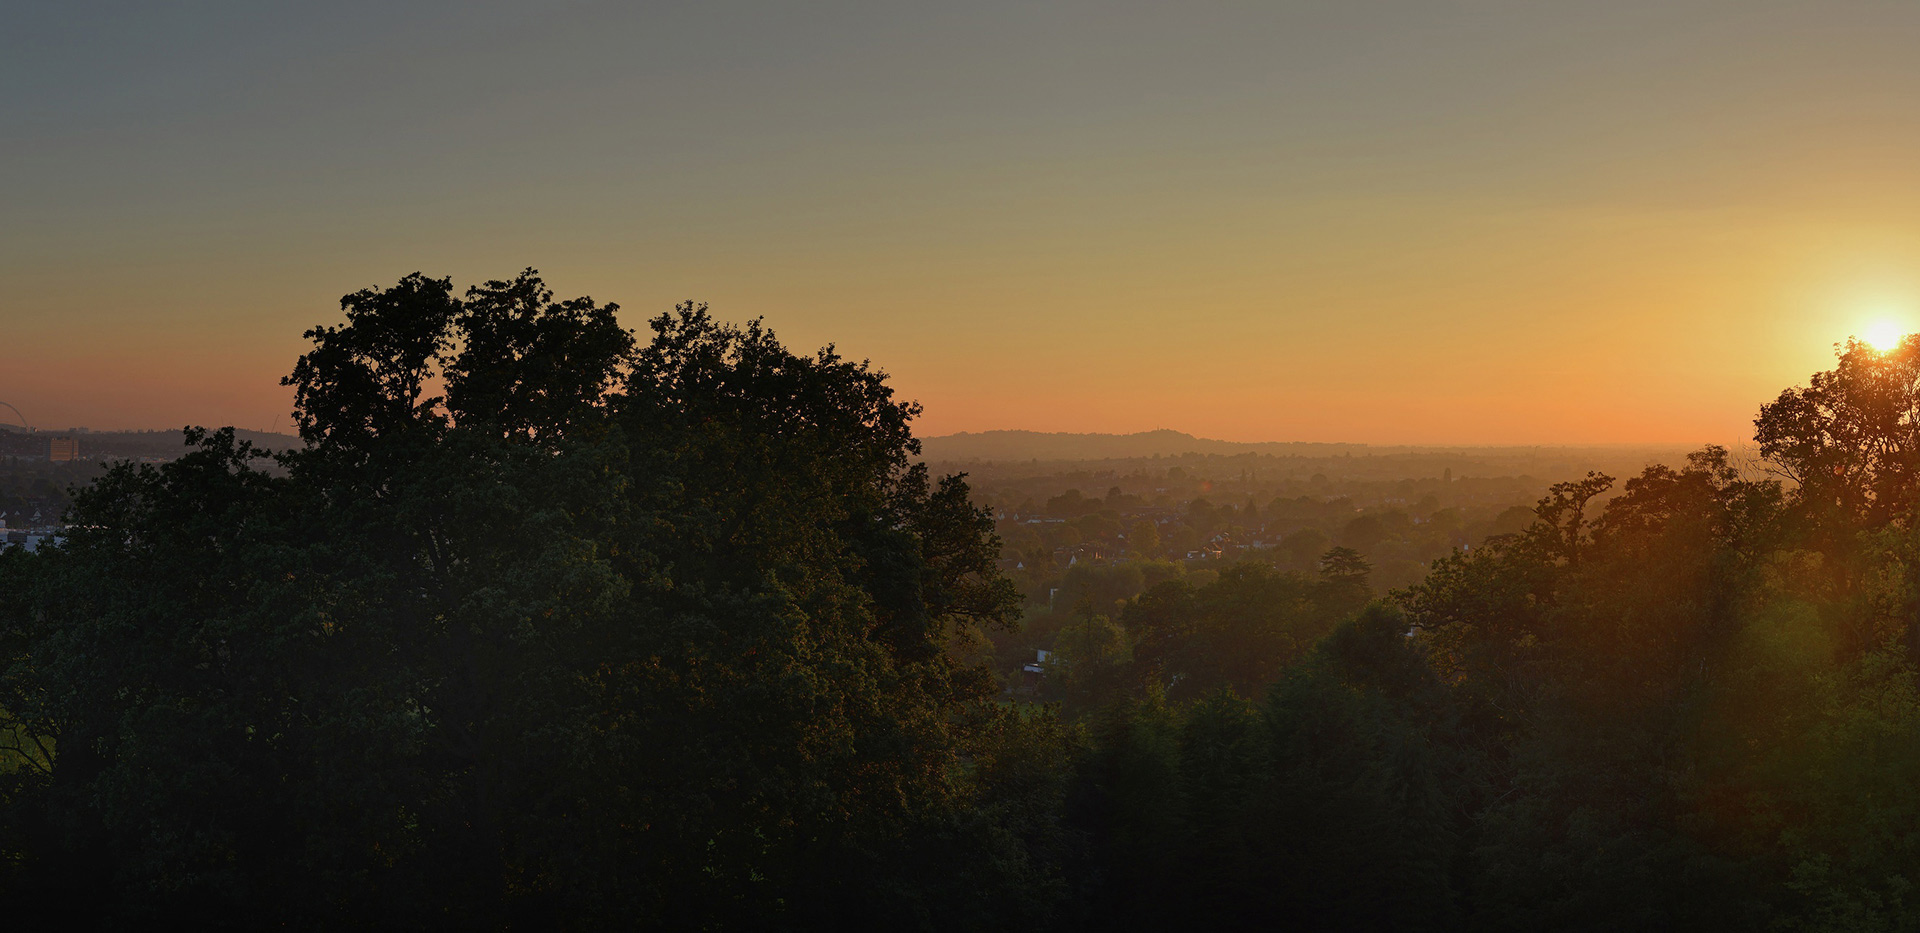 Berkeley, St Joseph's Gate, Sunset View